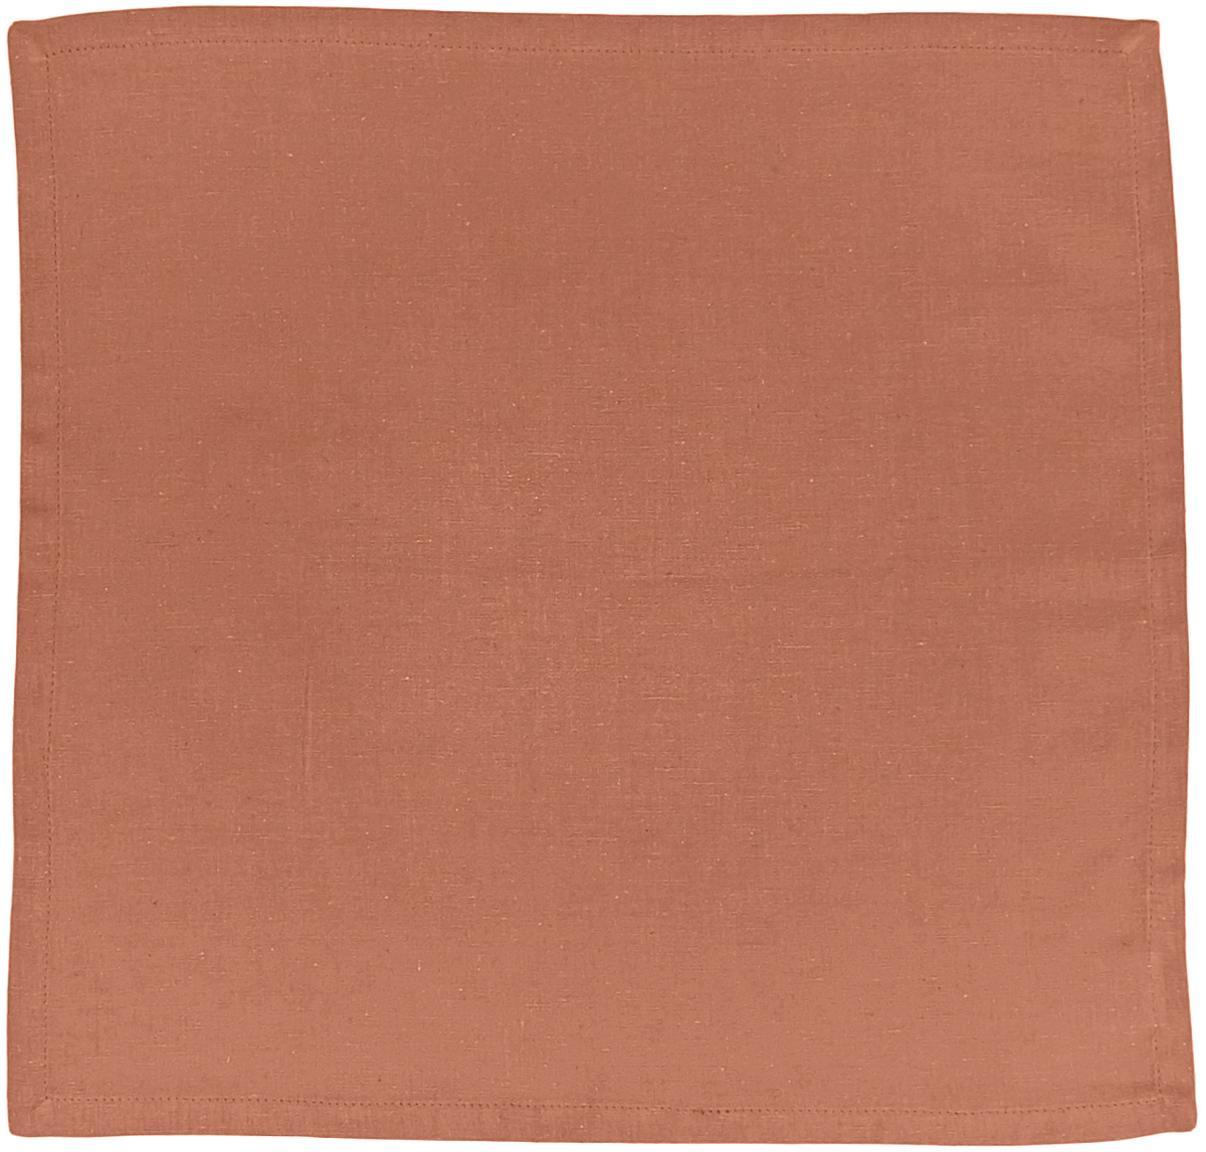 Servilletas de algodón/lino Hemmed, 6uds., 85%algodón, 15%lino, Marrón, An 40 x L 40 cm